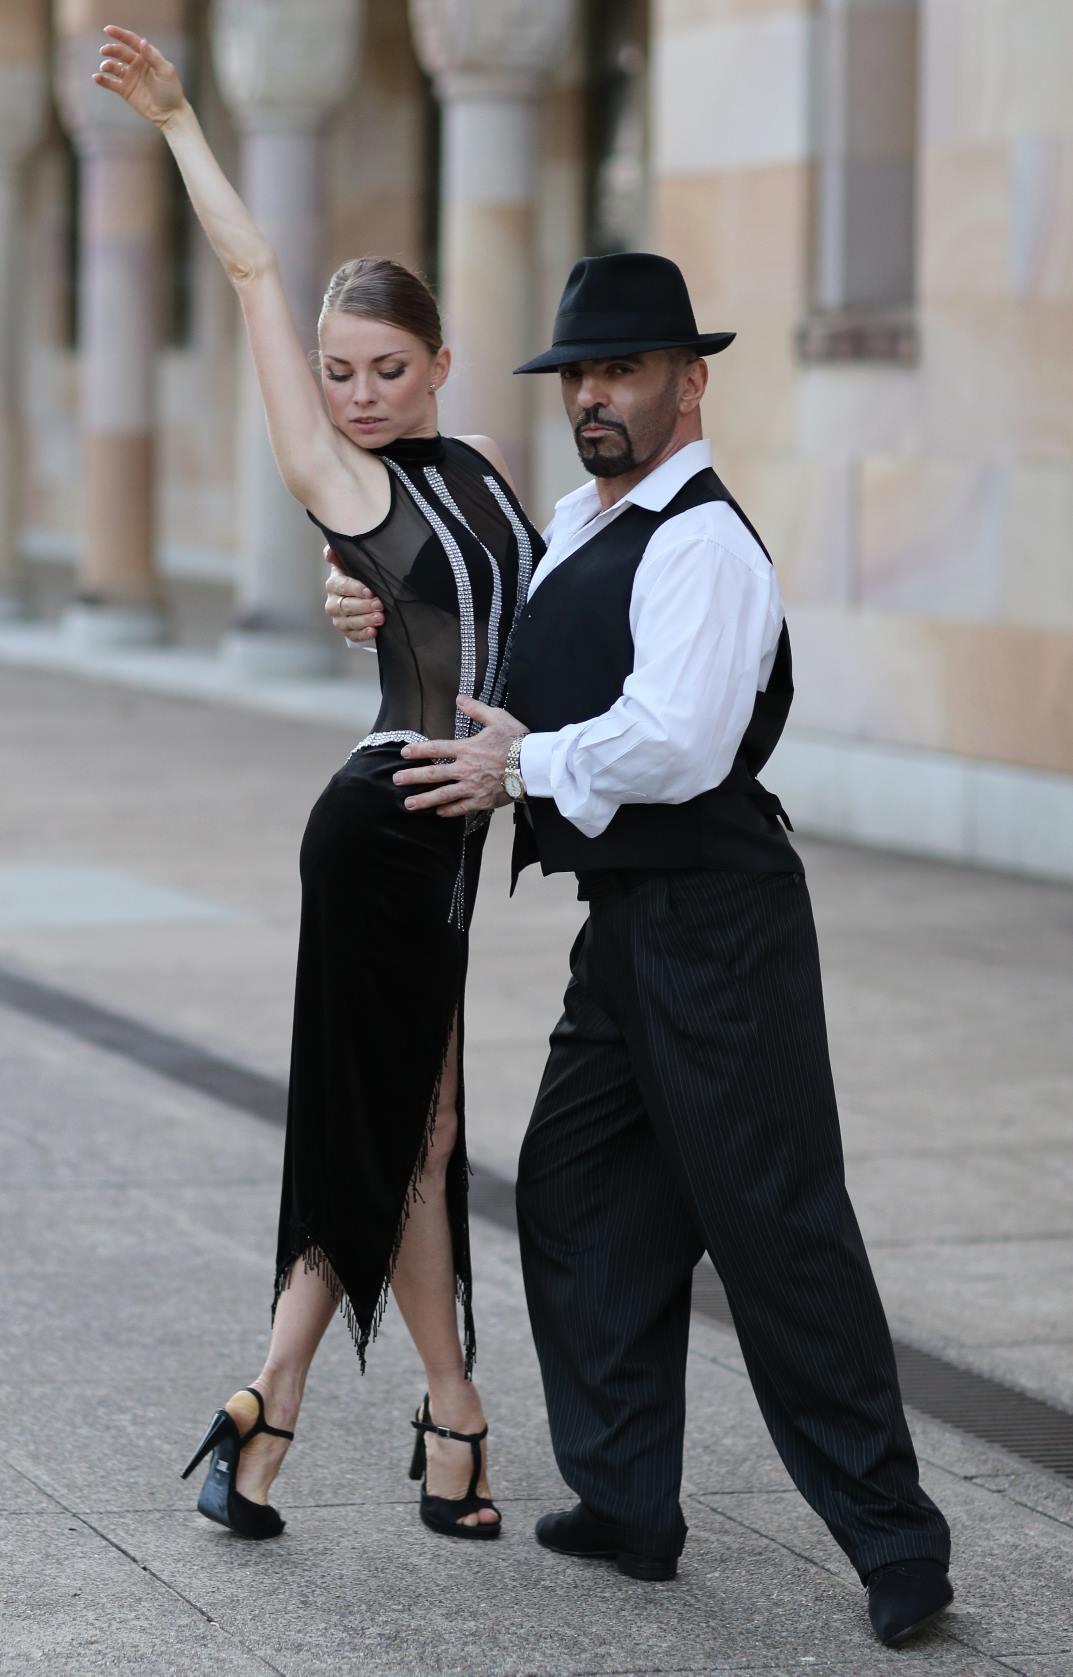 Hugo Fernández & Natasha Kush